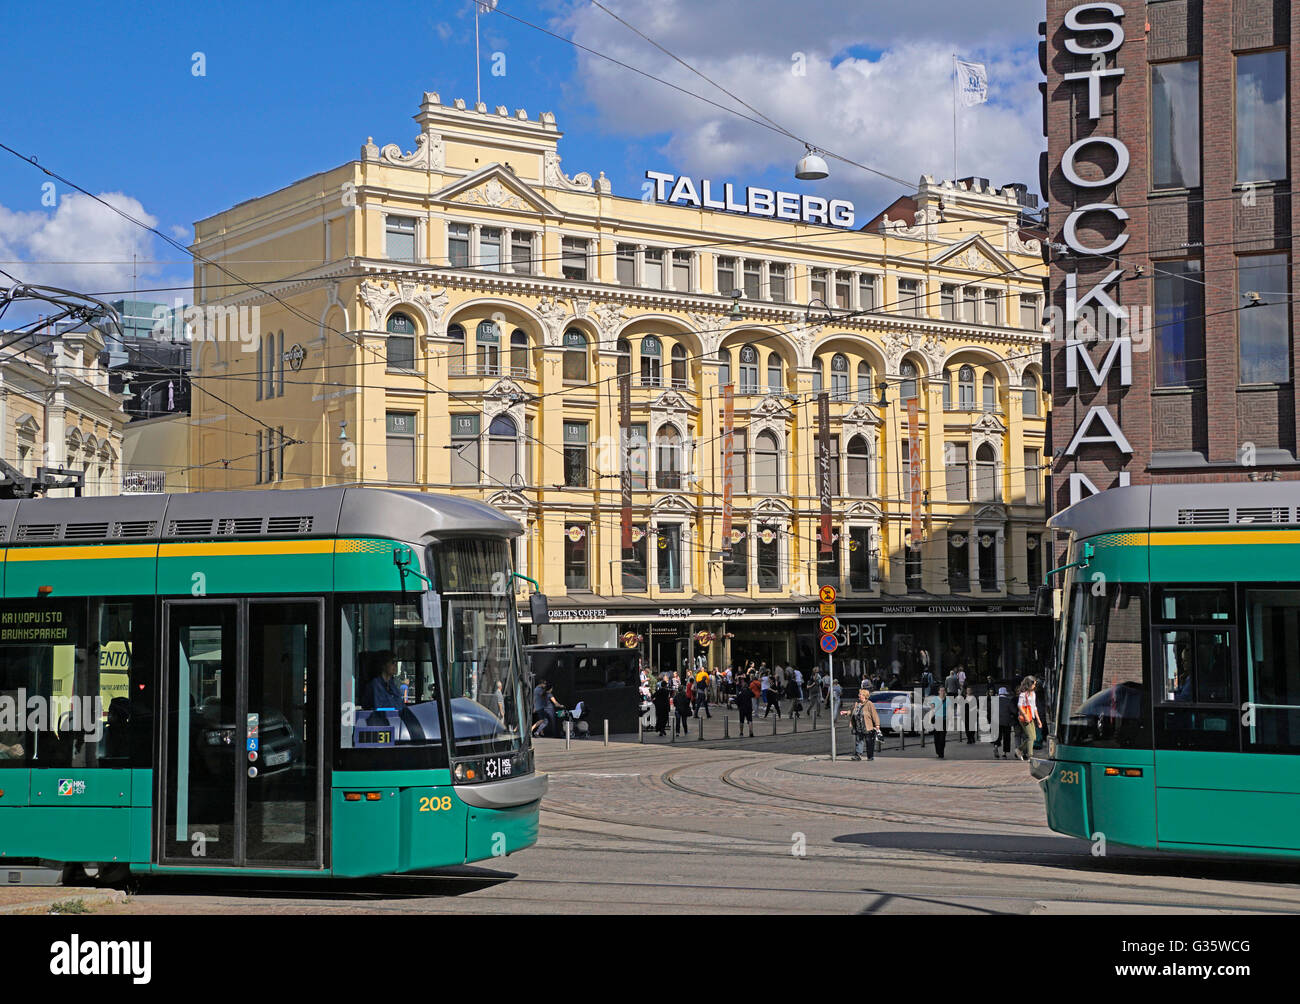 Landmark 1898 Tallberg Building in downtown Helsinki next To Stockman Department Store. - Stock Image